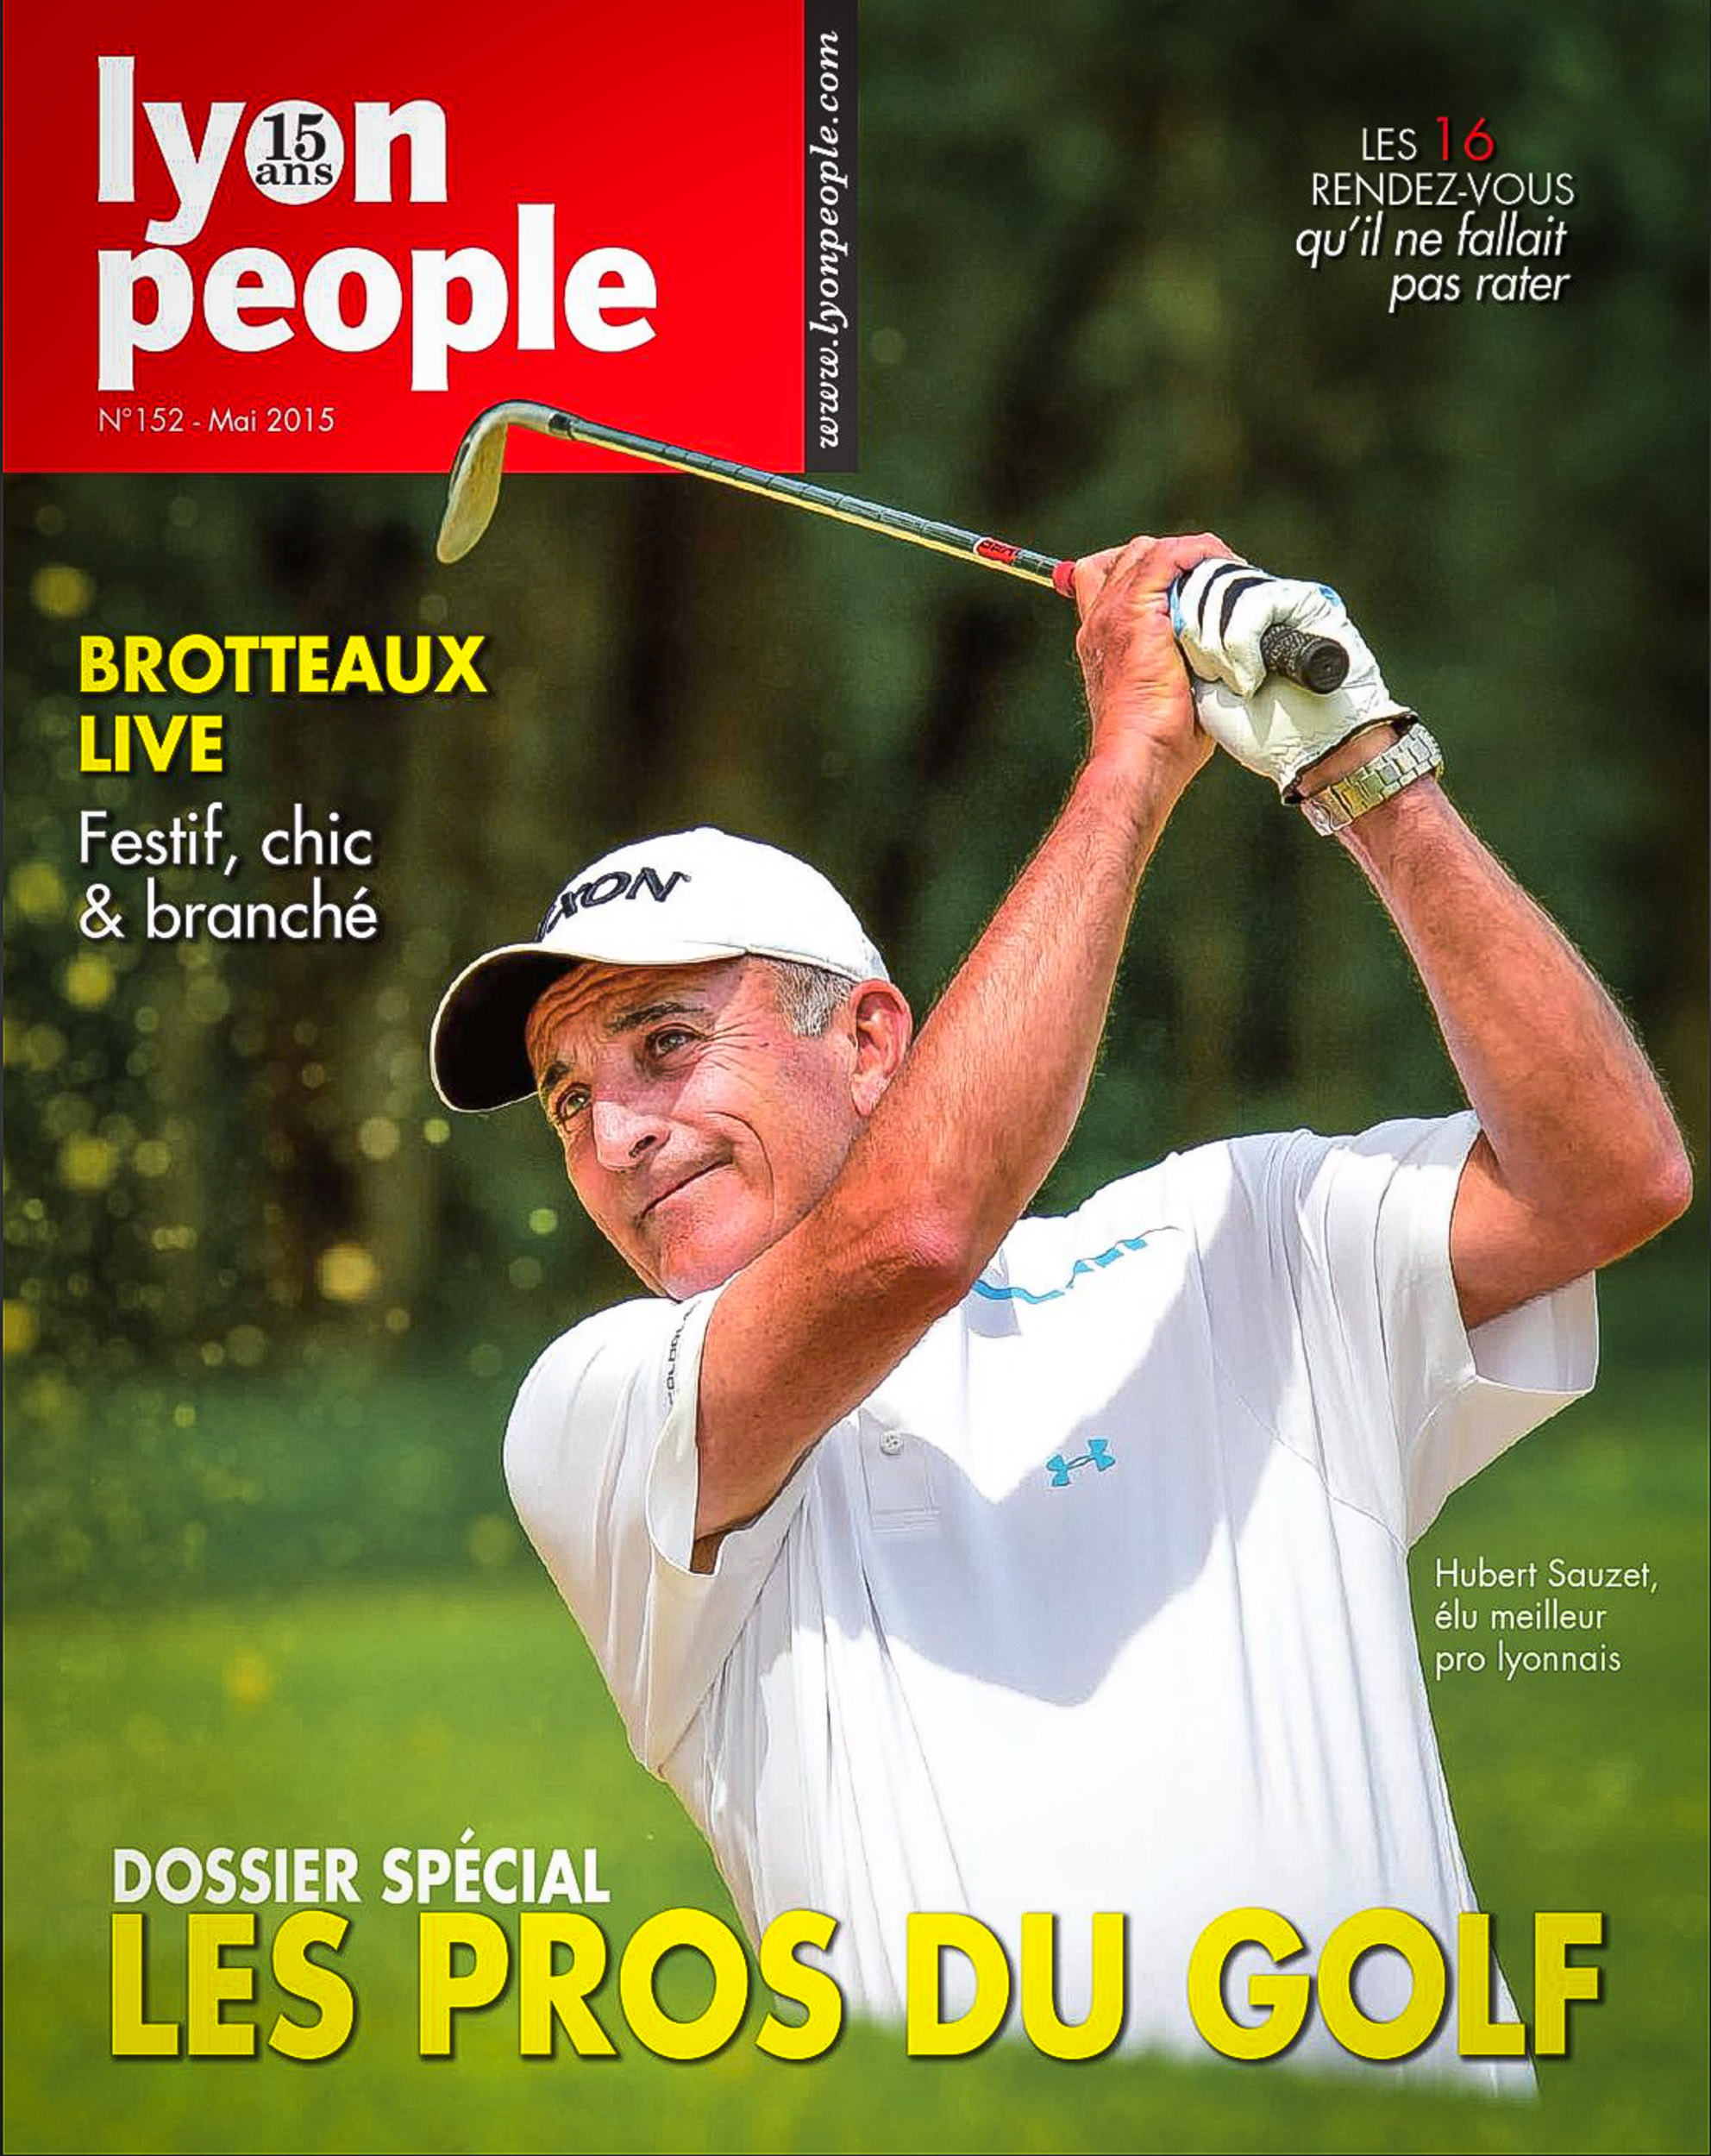 Couv Golf 1.jpg